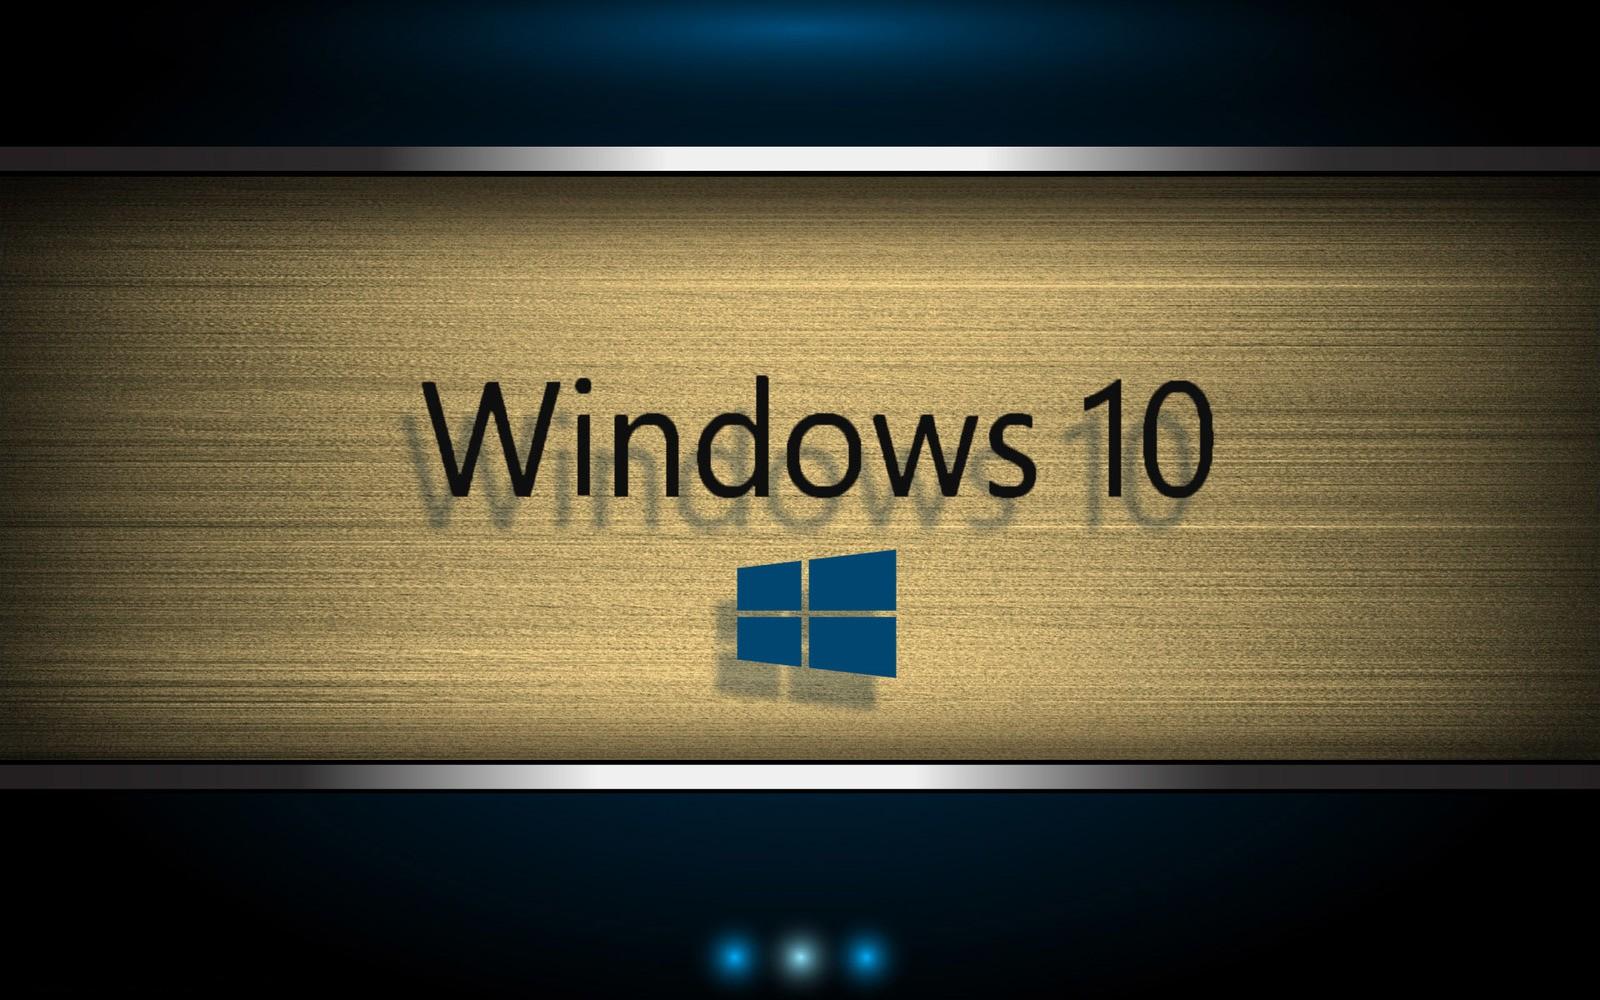 Windows 10 Original Wallpaper: Papel De Parede : Windows 10, Microsoft Windows, Pc Bsd